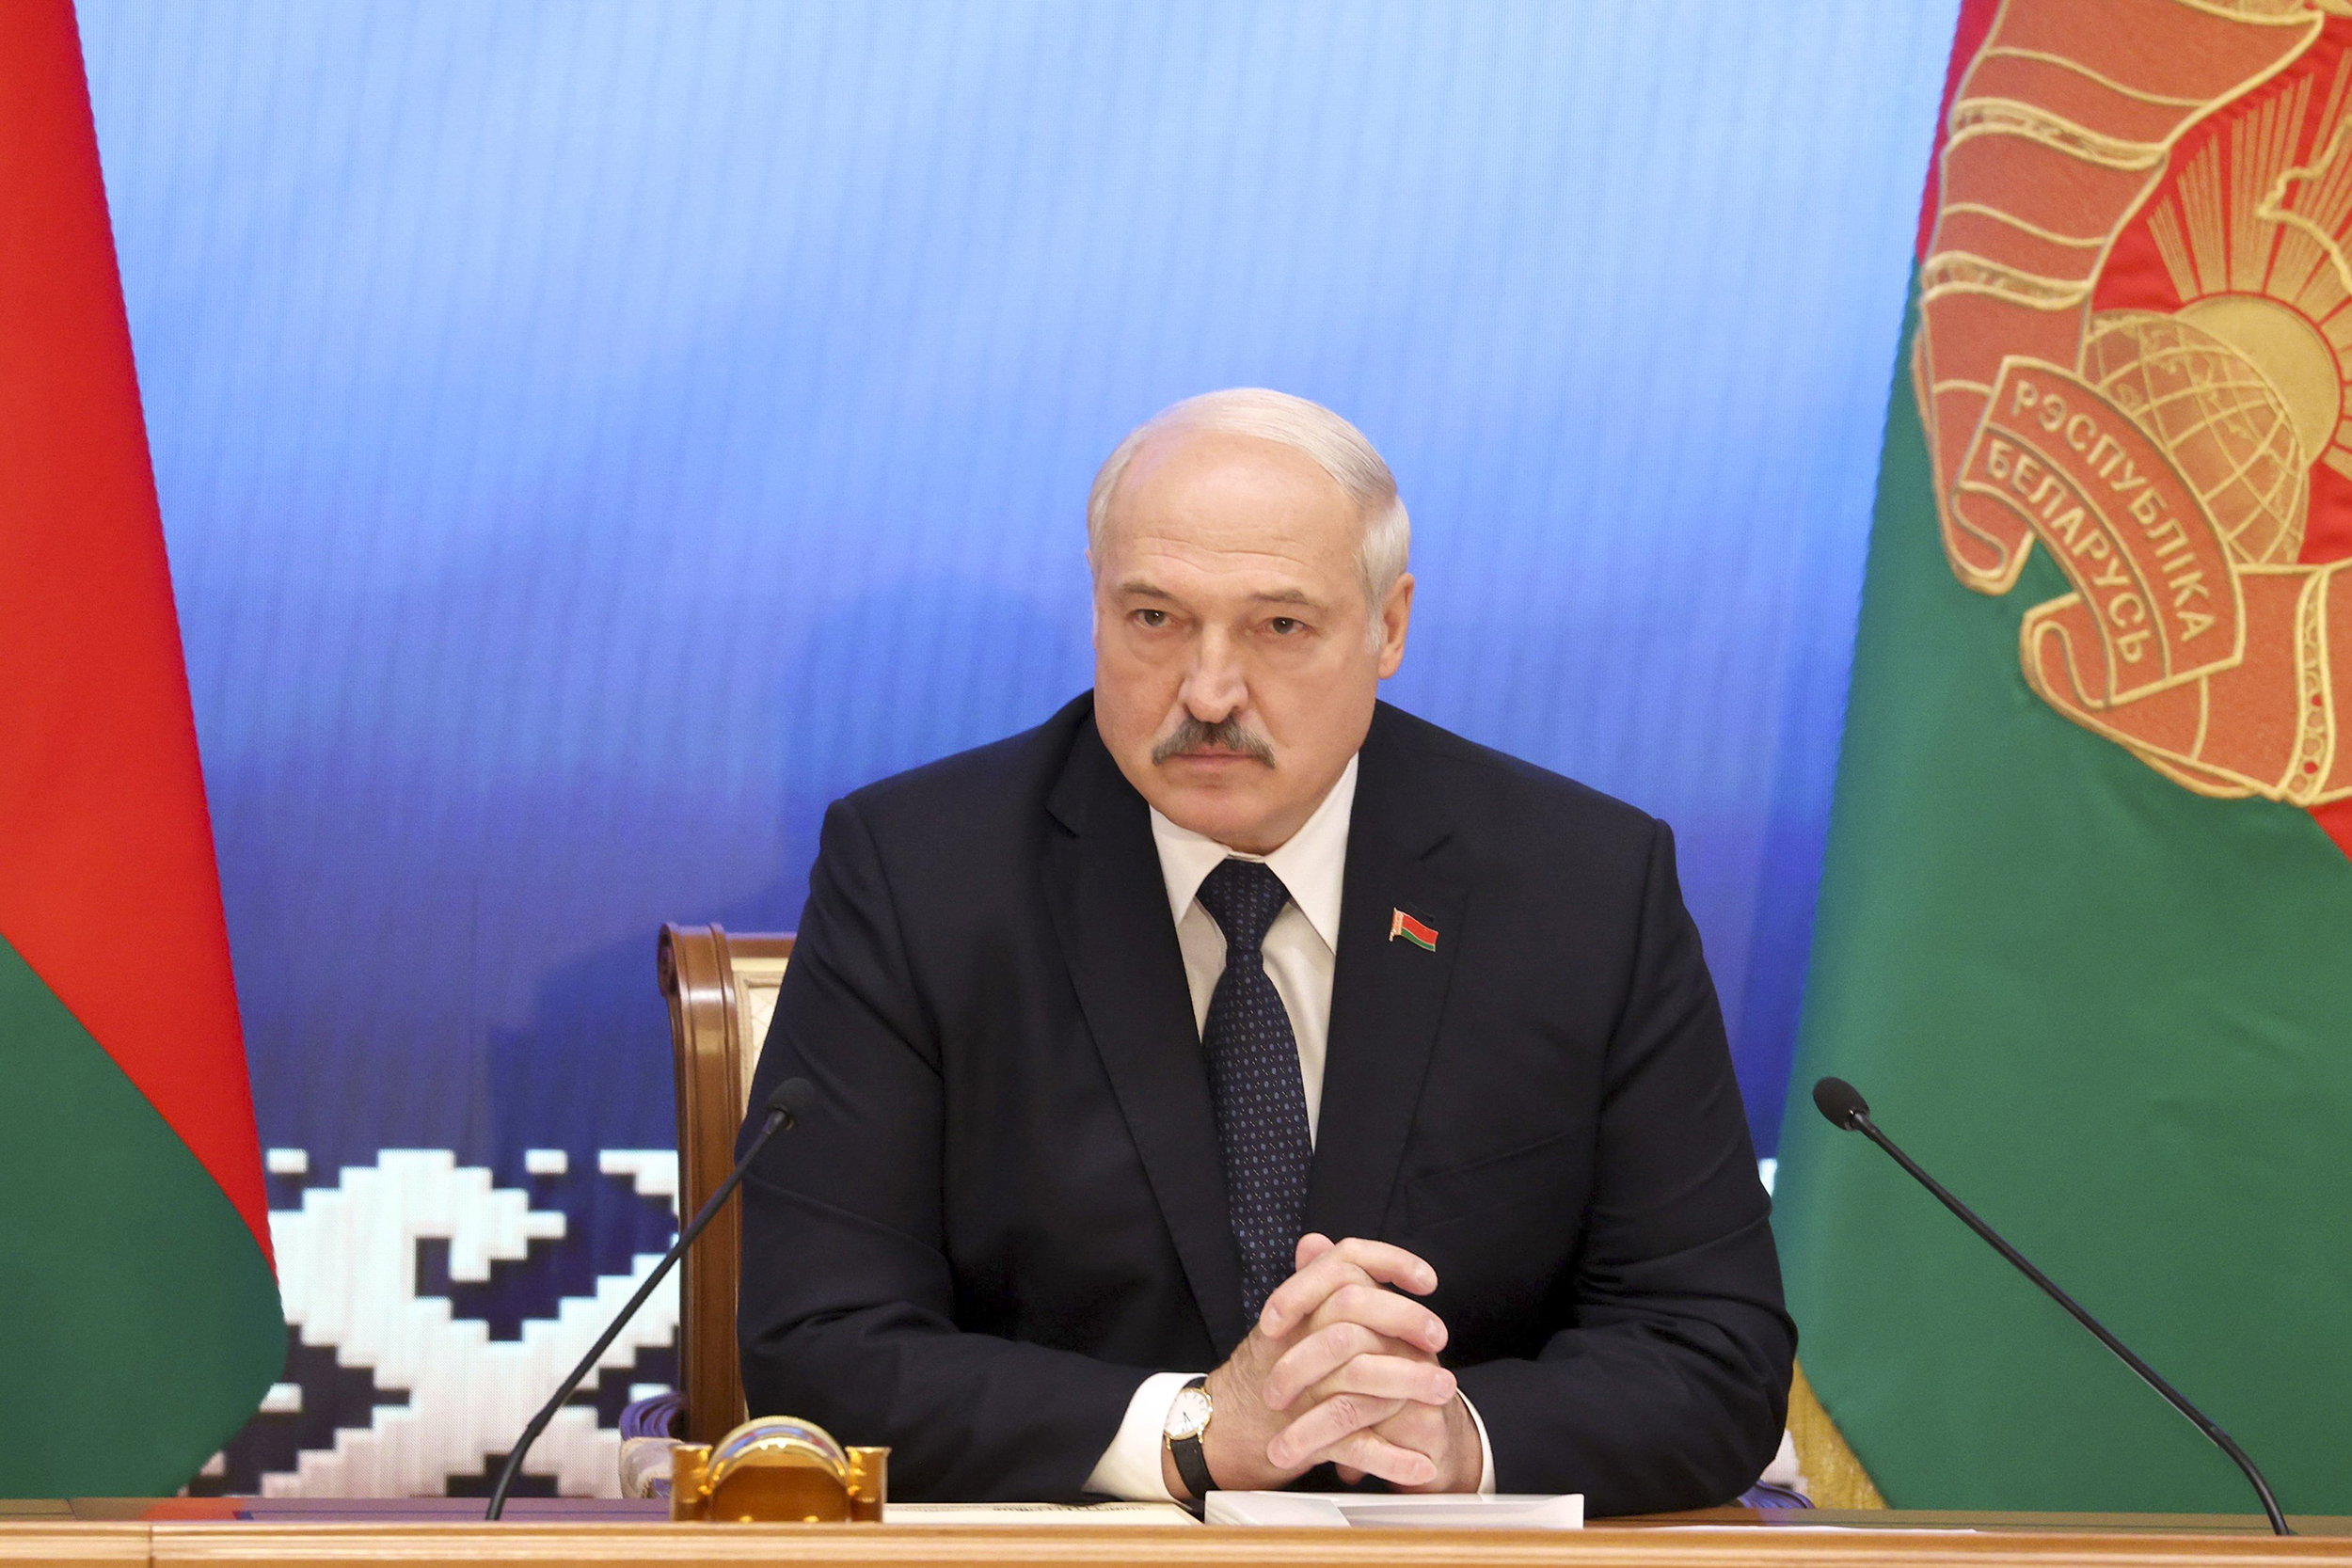 Belarus revokes consent for U.S. ambassador, demands embassy staff cuts in row over sanctions